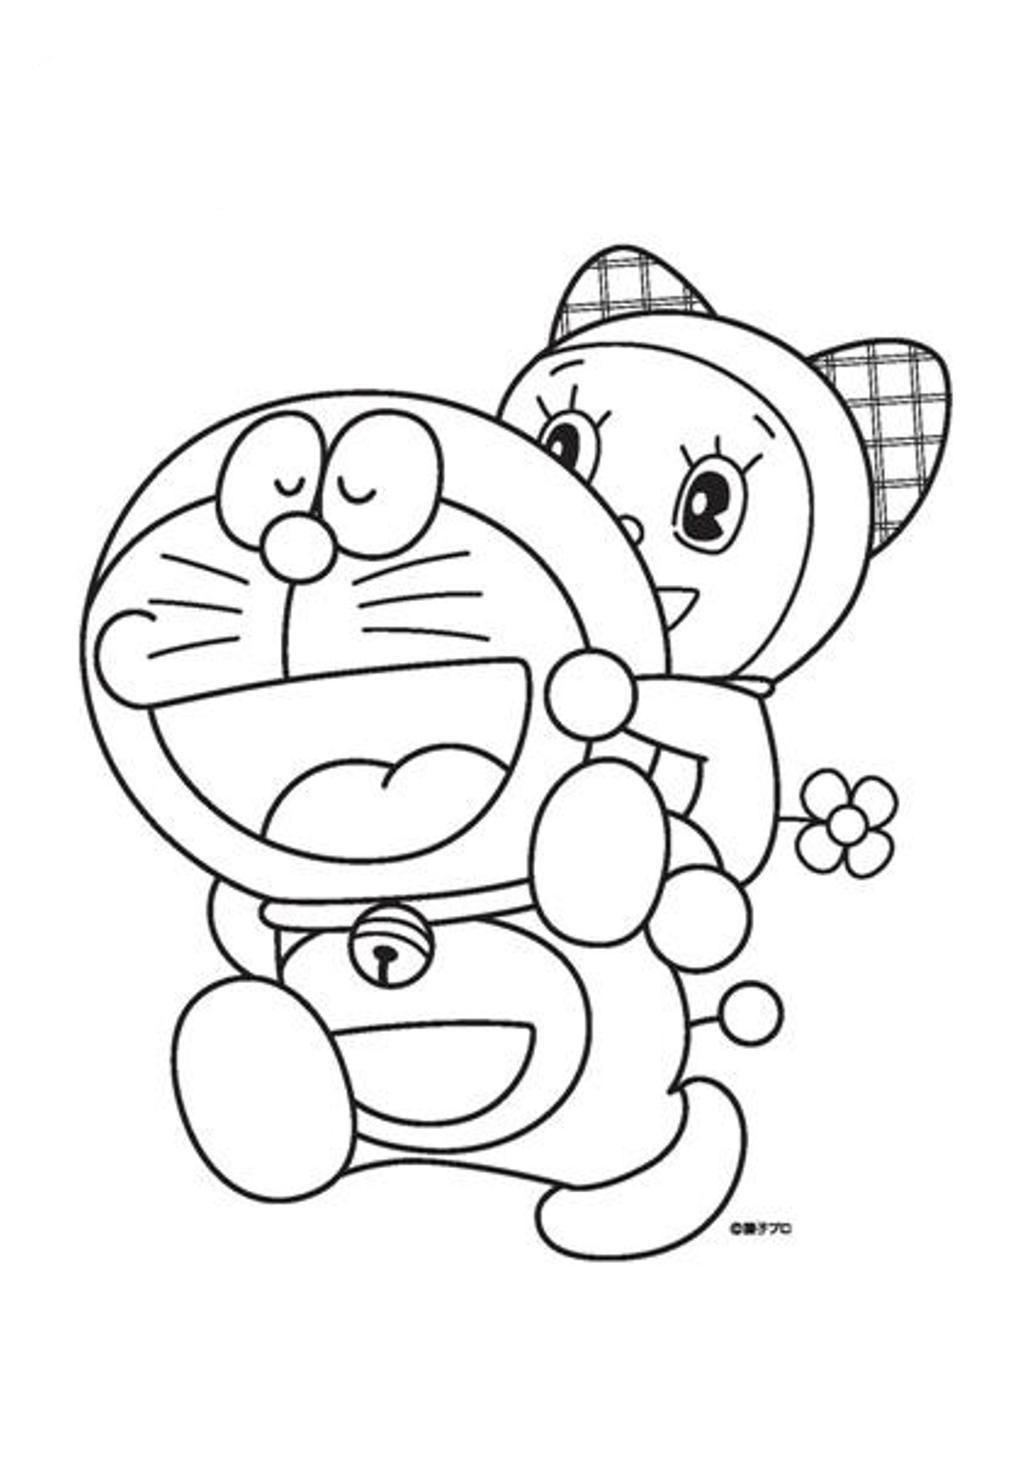 Doraemon Coloring Pages Best Coloring Pages For Kids Cartoon Coloring Pages Coloring Books Kitty Coloring